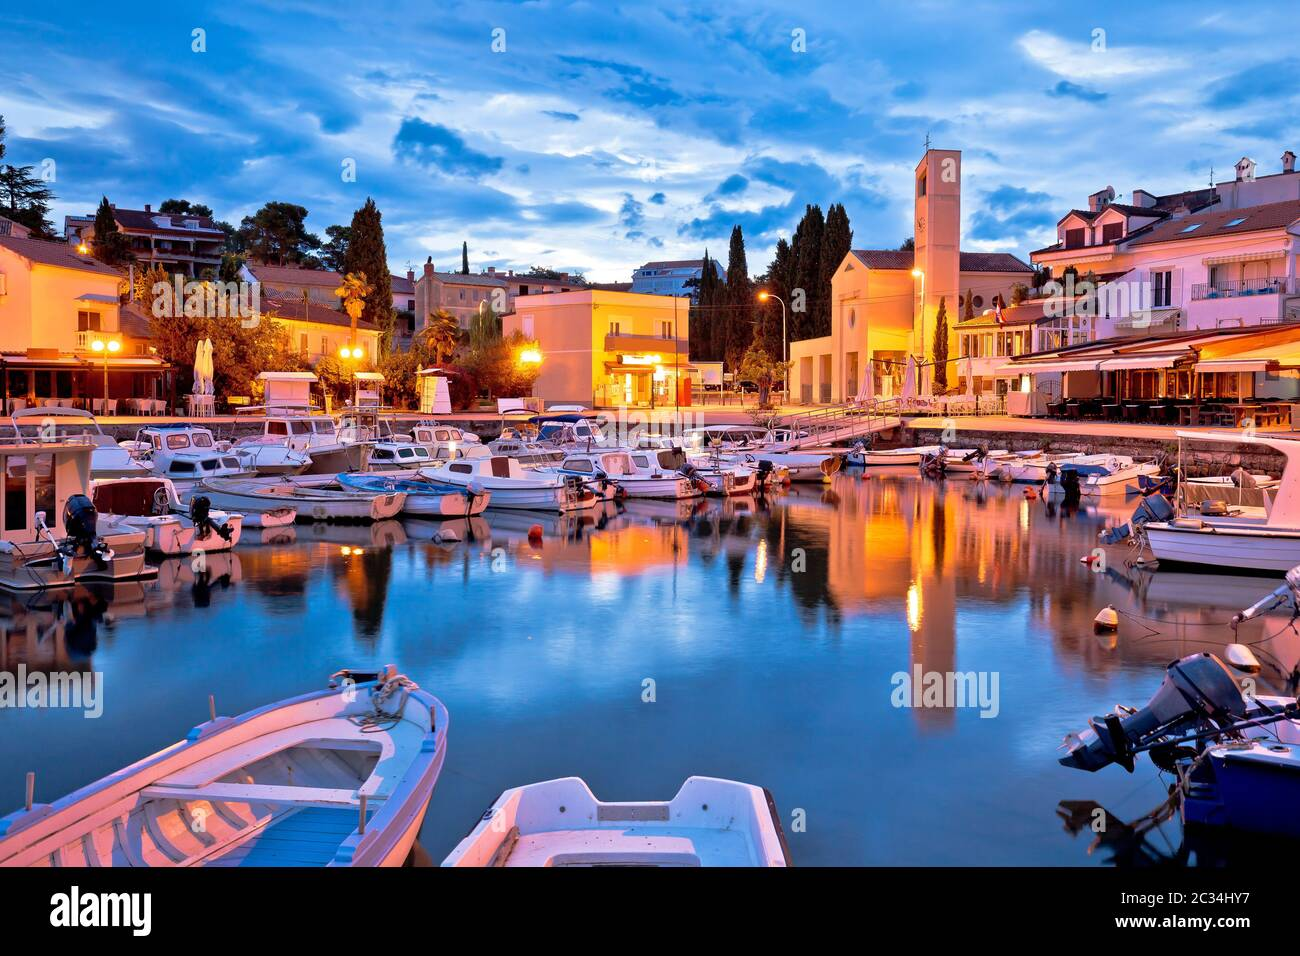 Krk. Town of Malinska waterfront and harbor dawn view, Krk island in Croatia Stock Photo